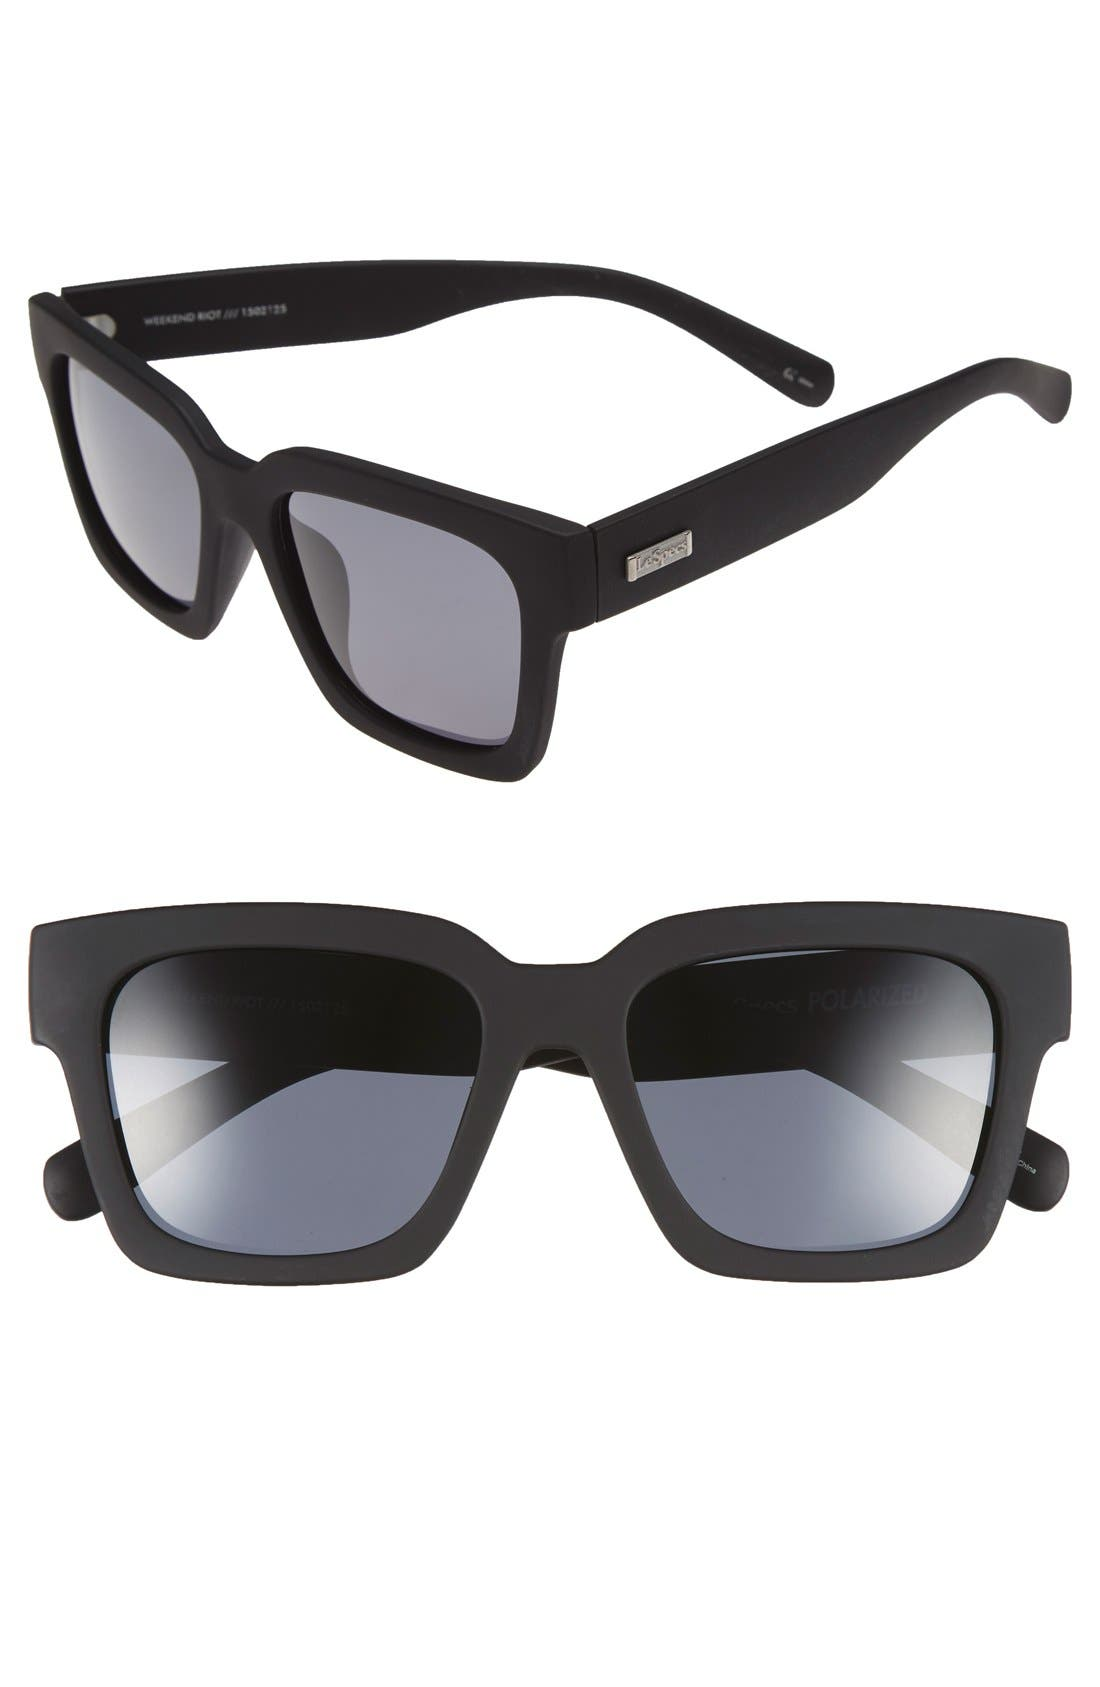 LE SPECS, 'Weekend Riot' 55mm Sunglasses, Main thumbnail 1, color, BLACK RUBBER/ SMOKE MONO POLAR